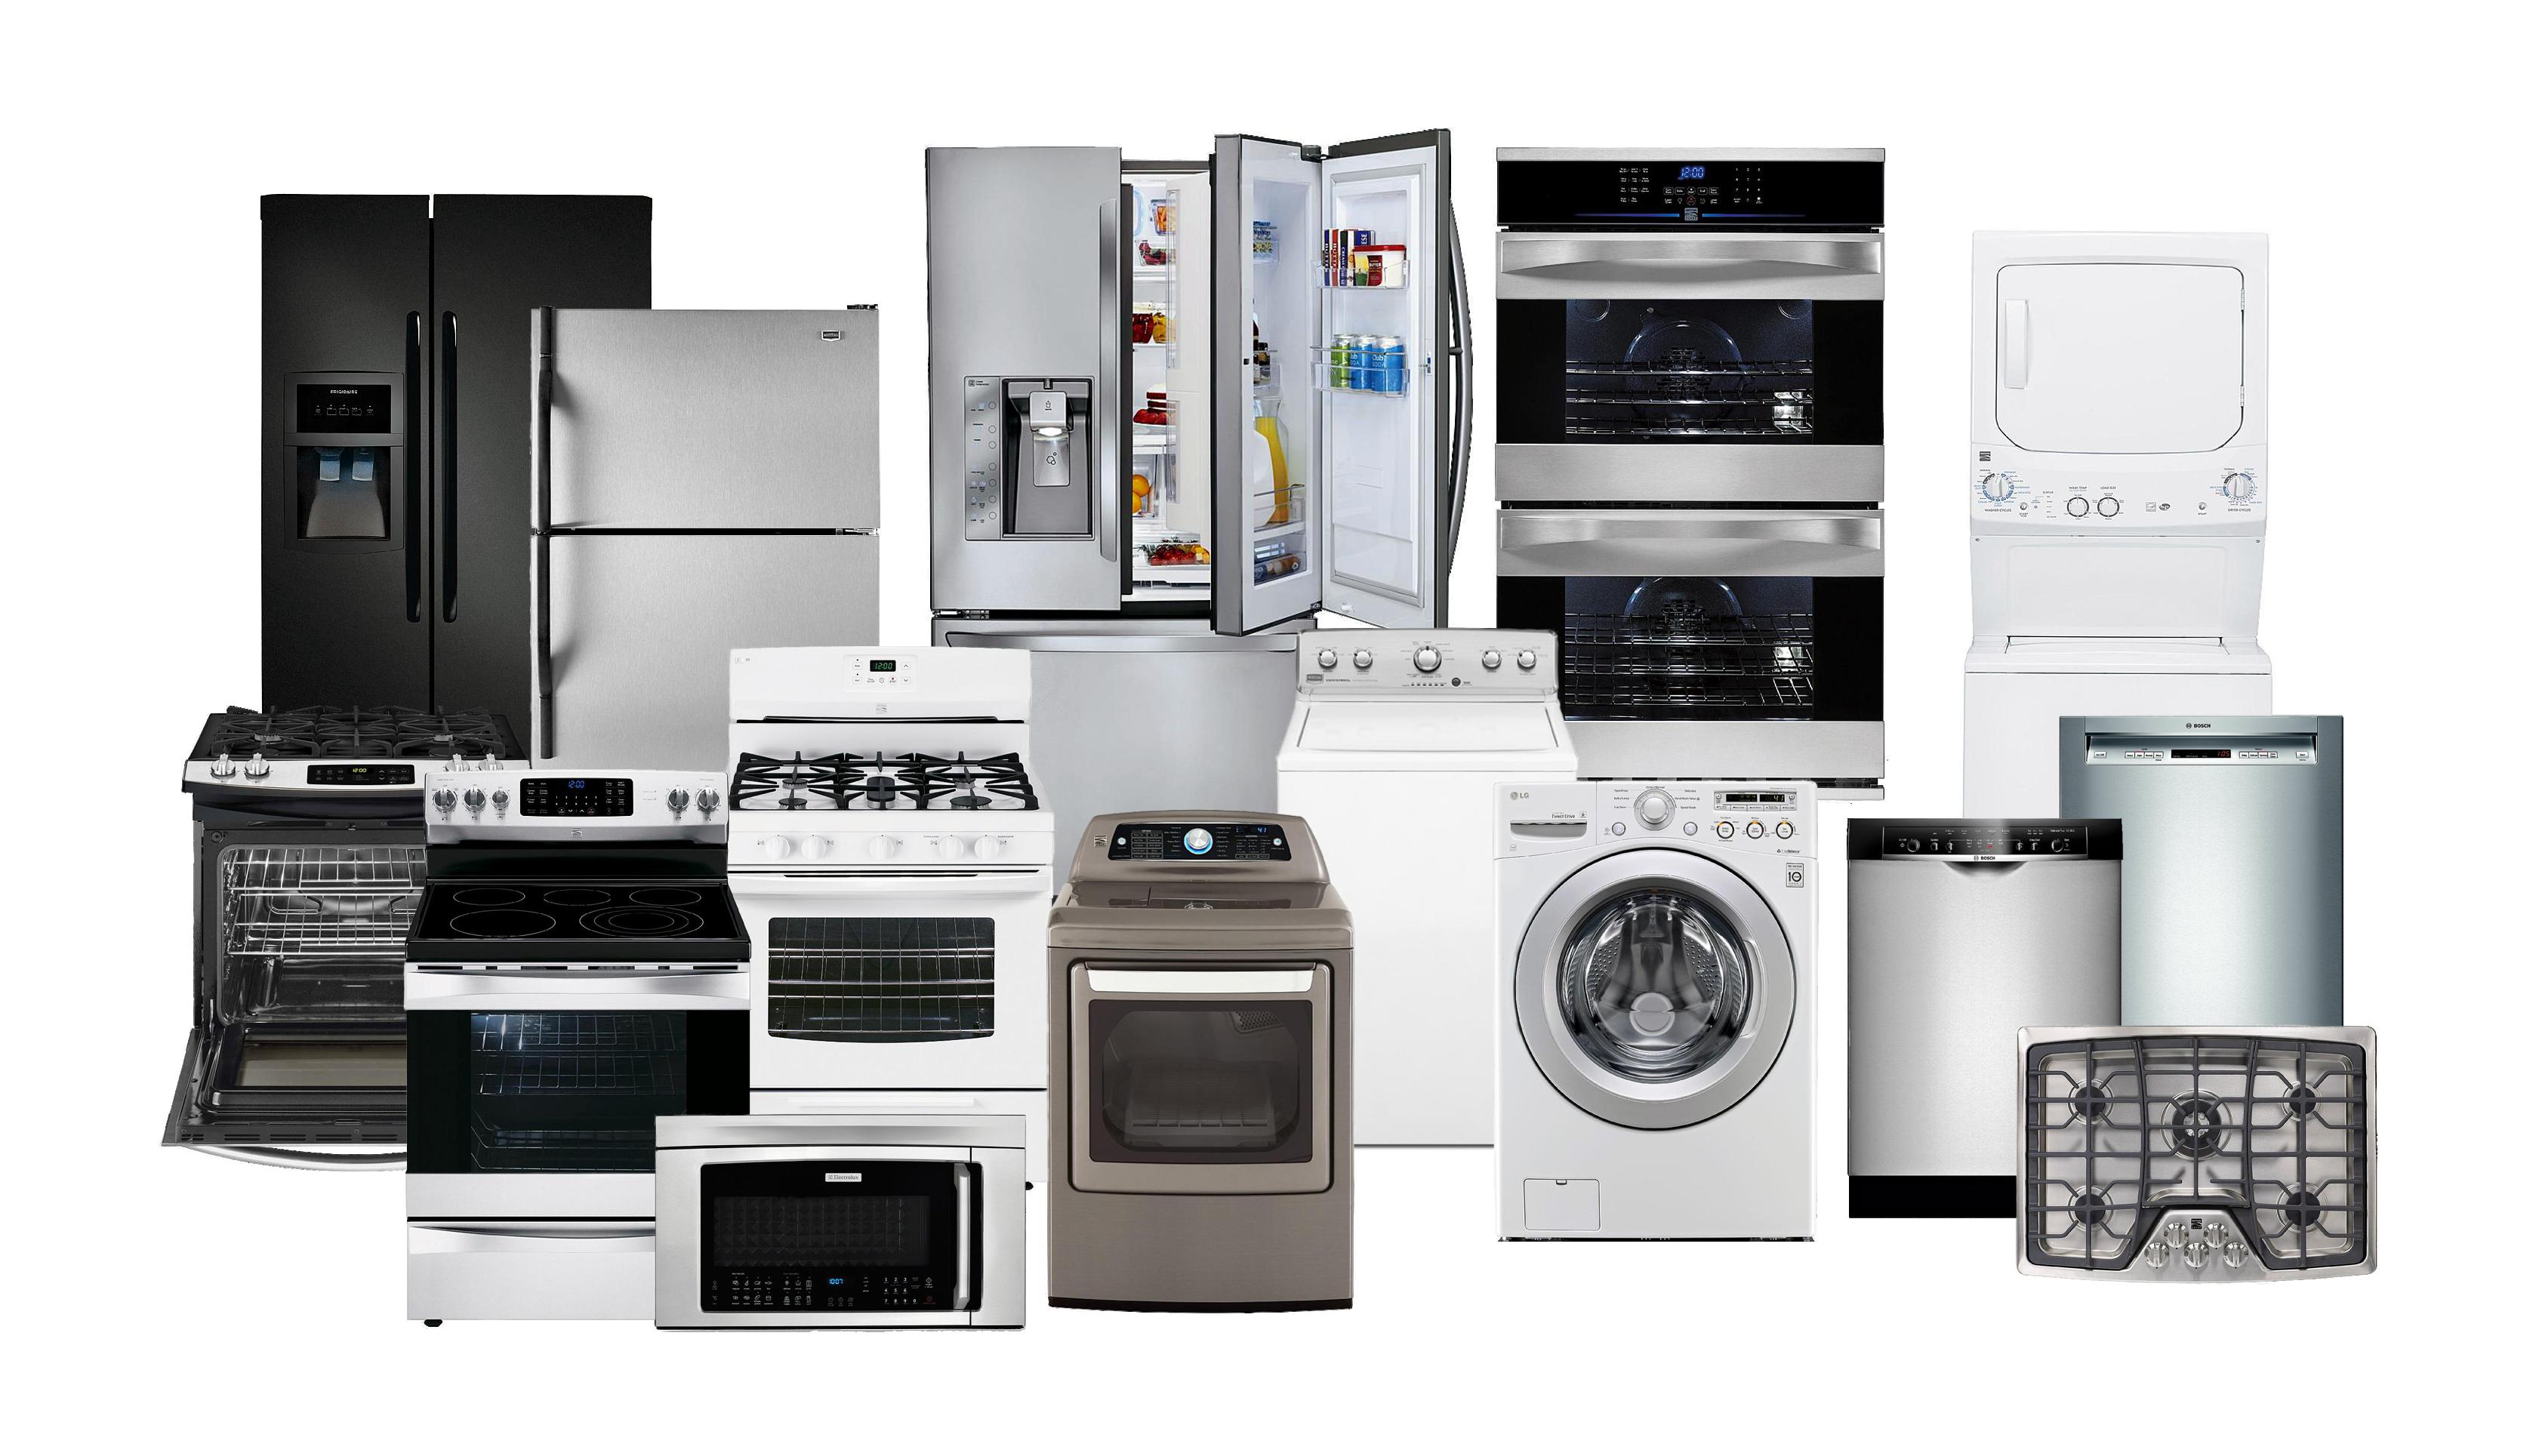 Appliance Repair Service Vancouver Appliance Repair Home Appliances Fridge Repair